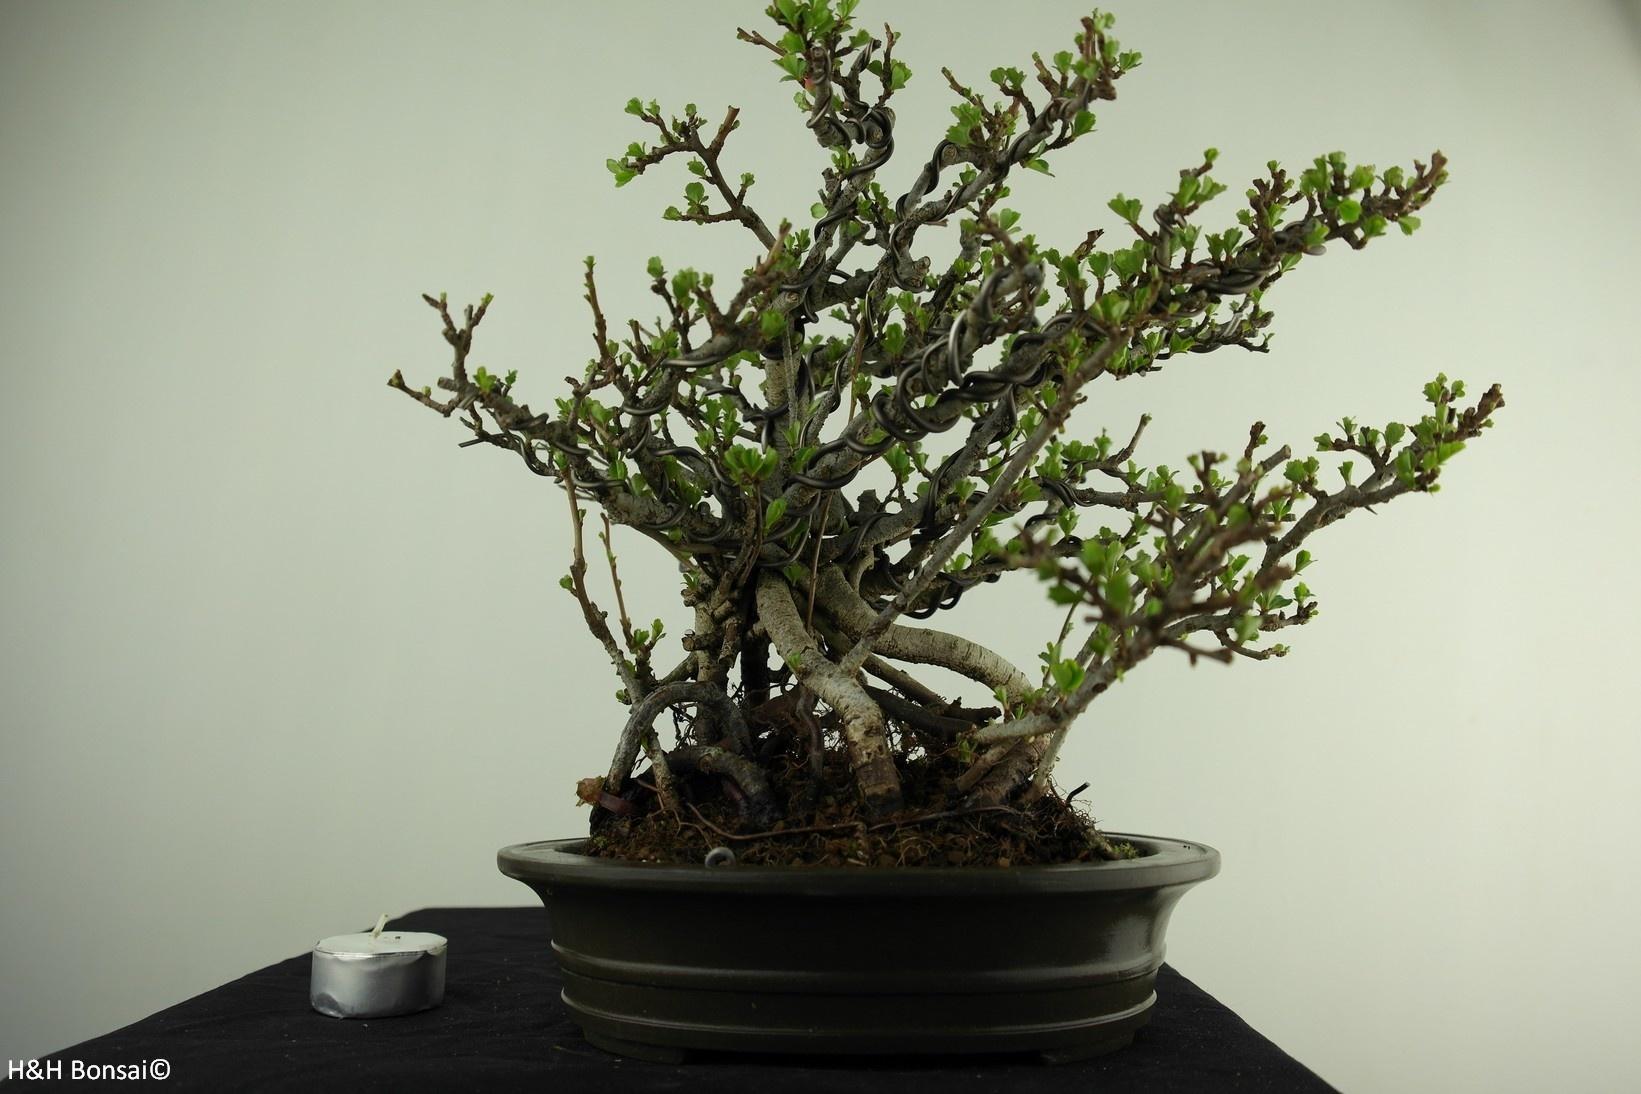 Bonsai Japanese quince, Chaenomeles japonica, no. 7796